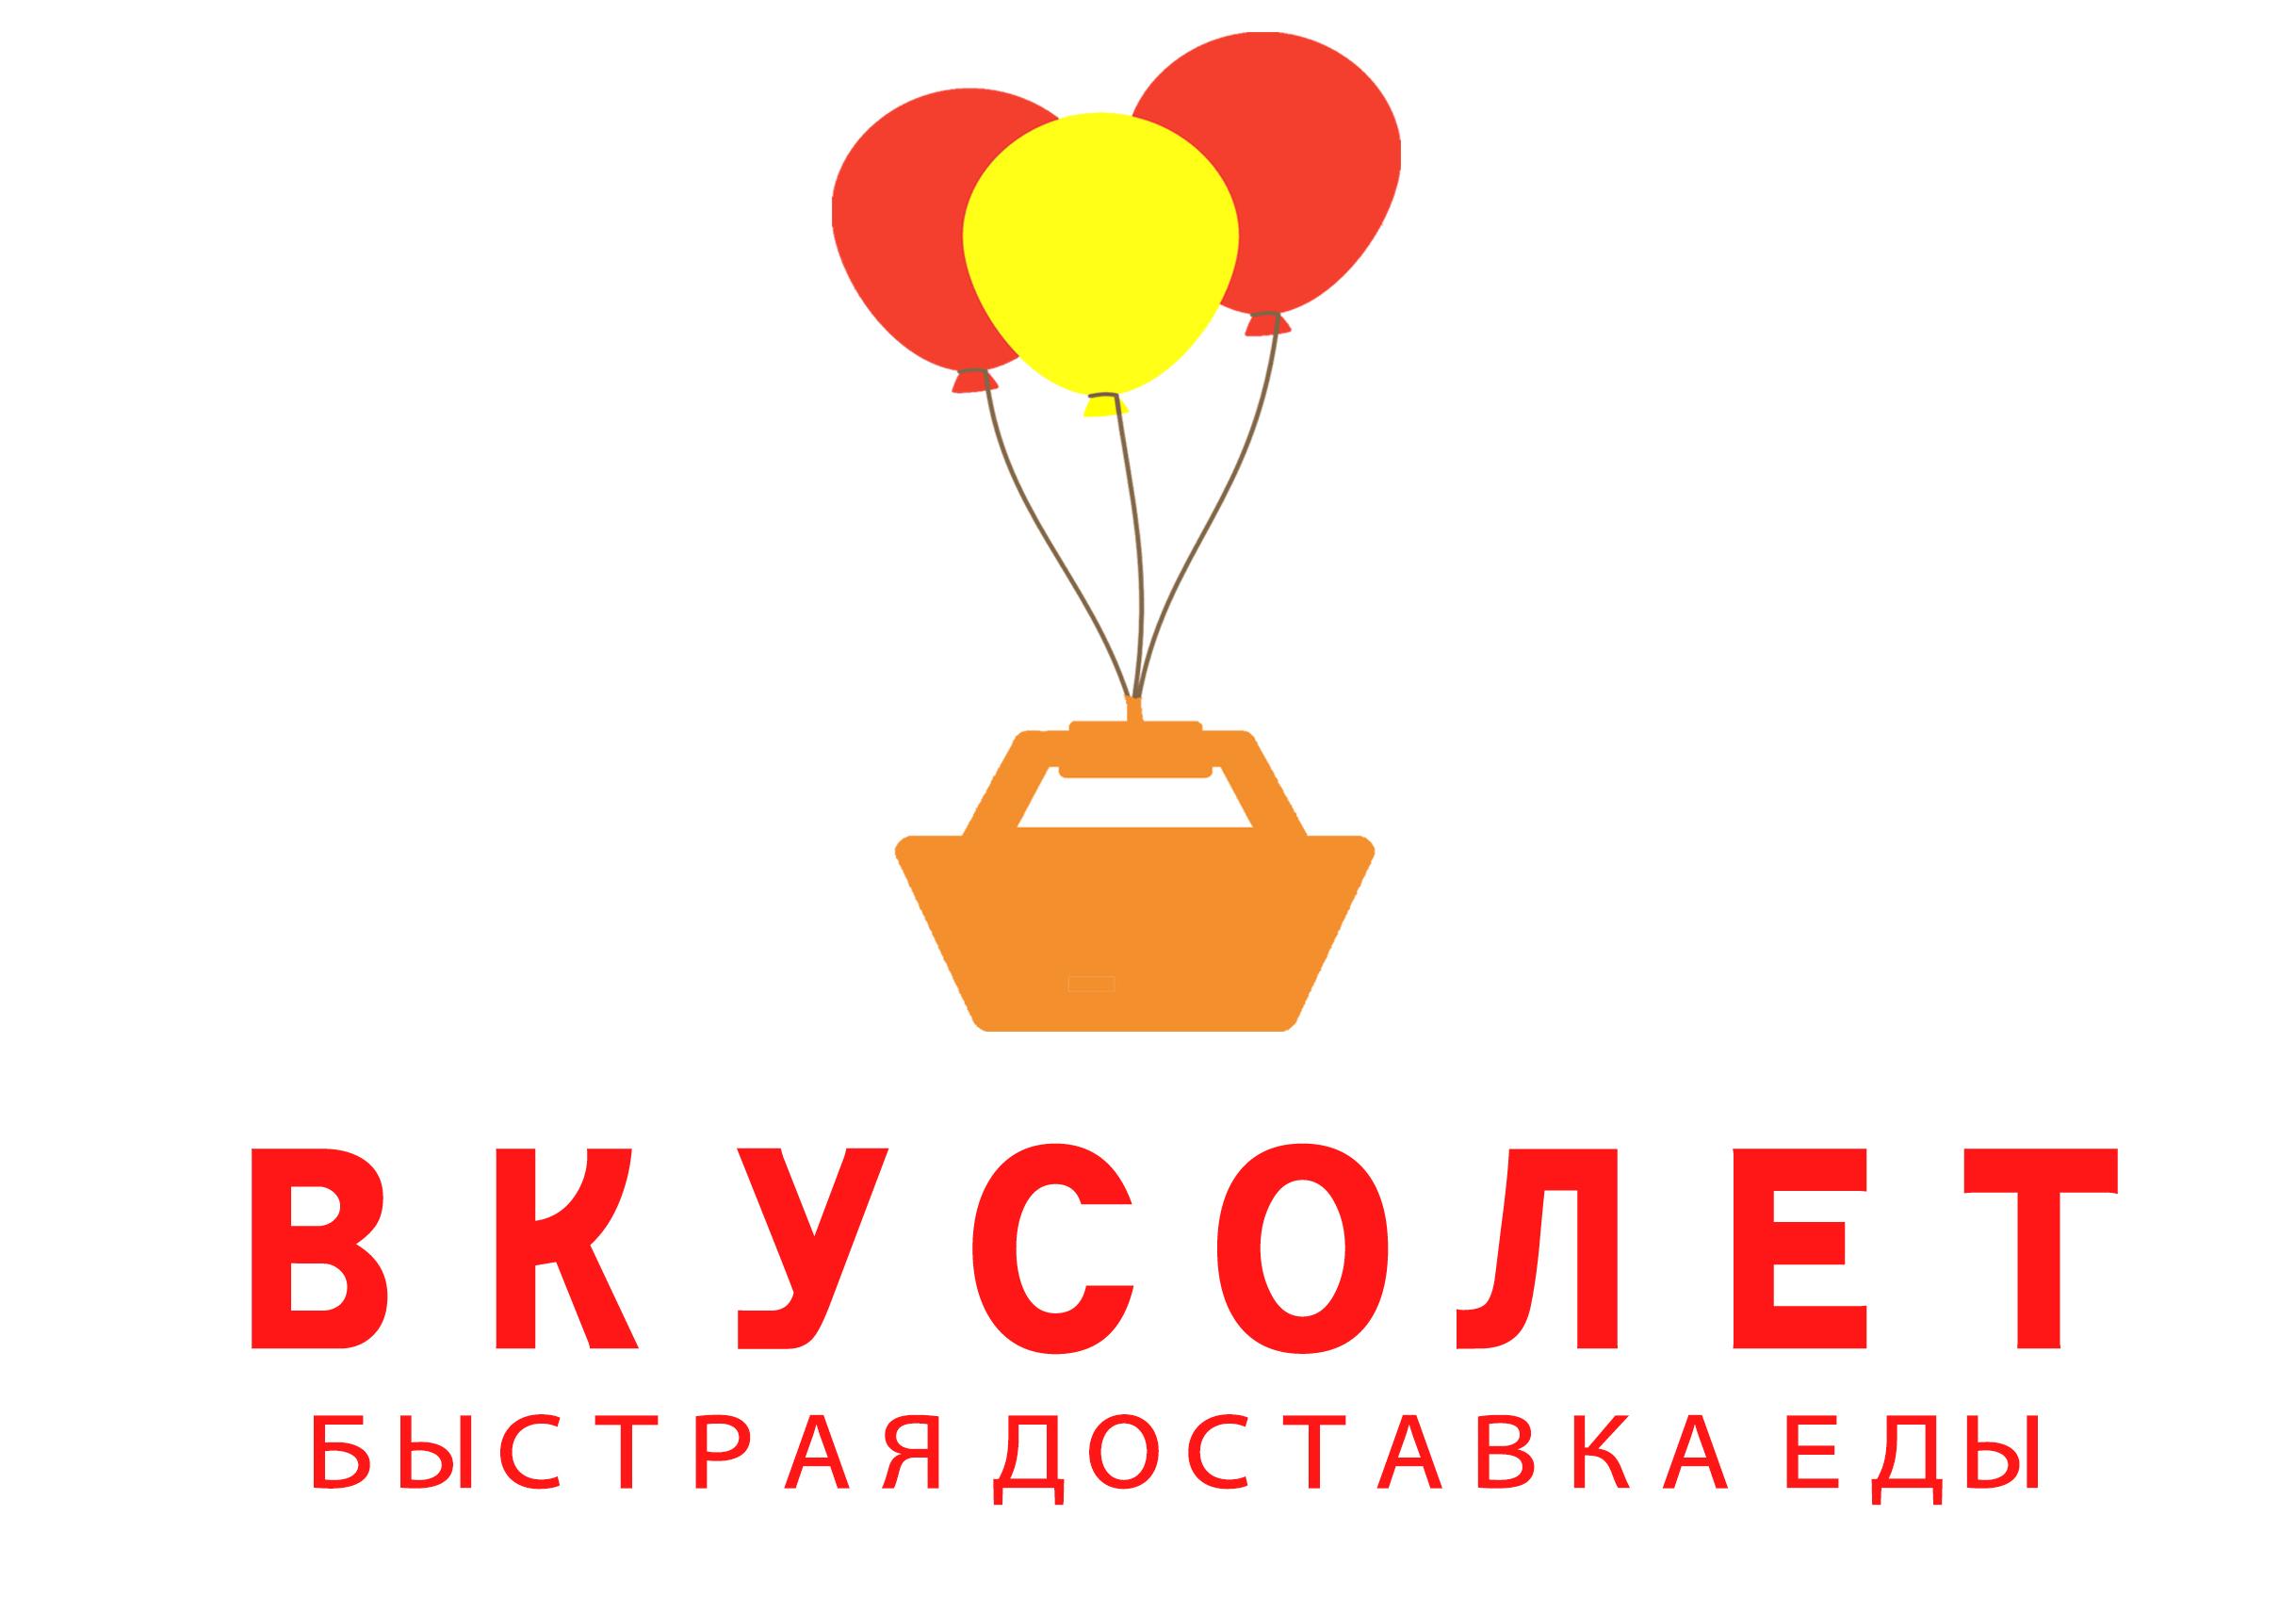 Логотип для доставки еды фото f_62659d523713bef5.jpg